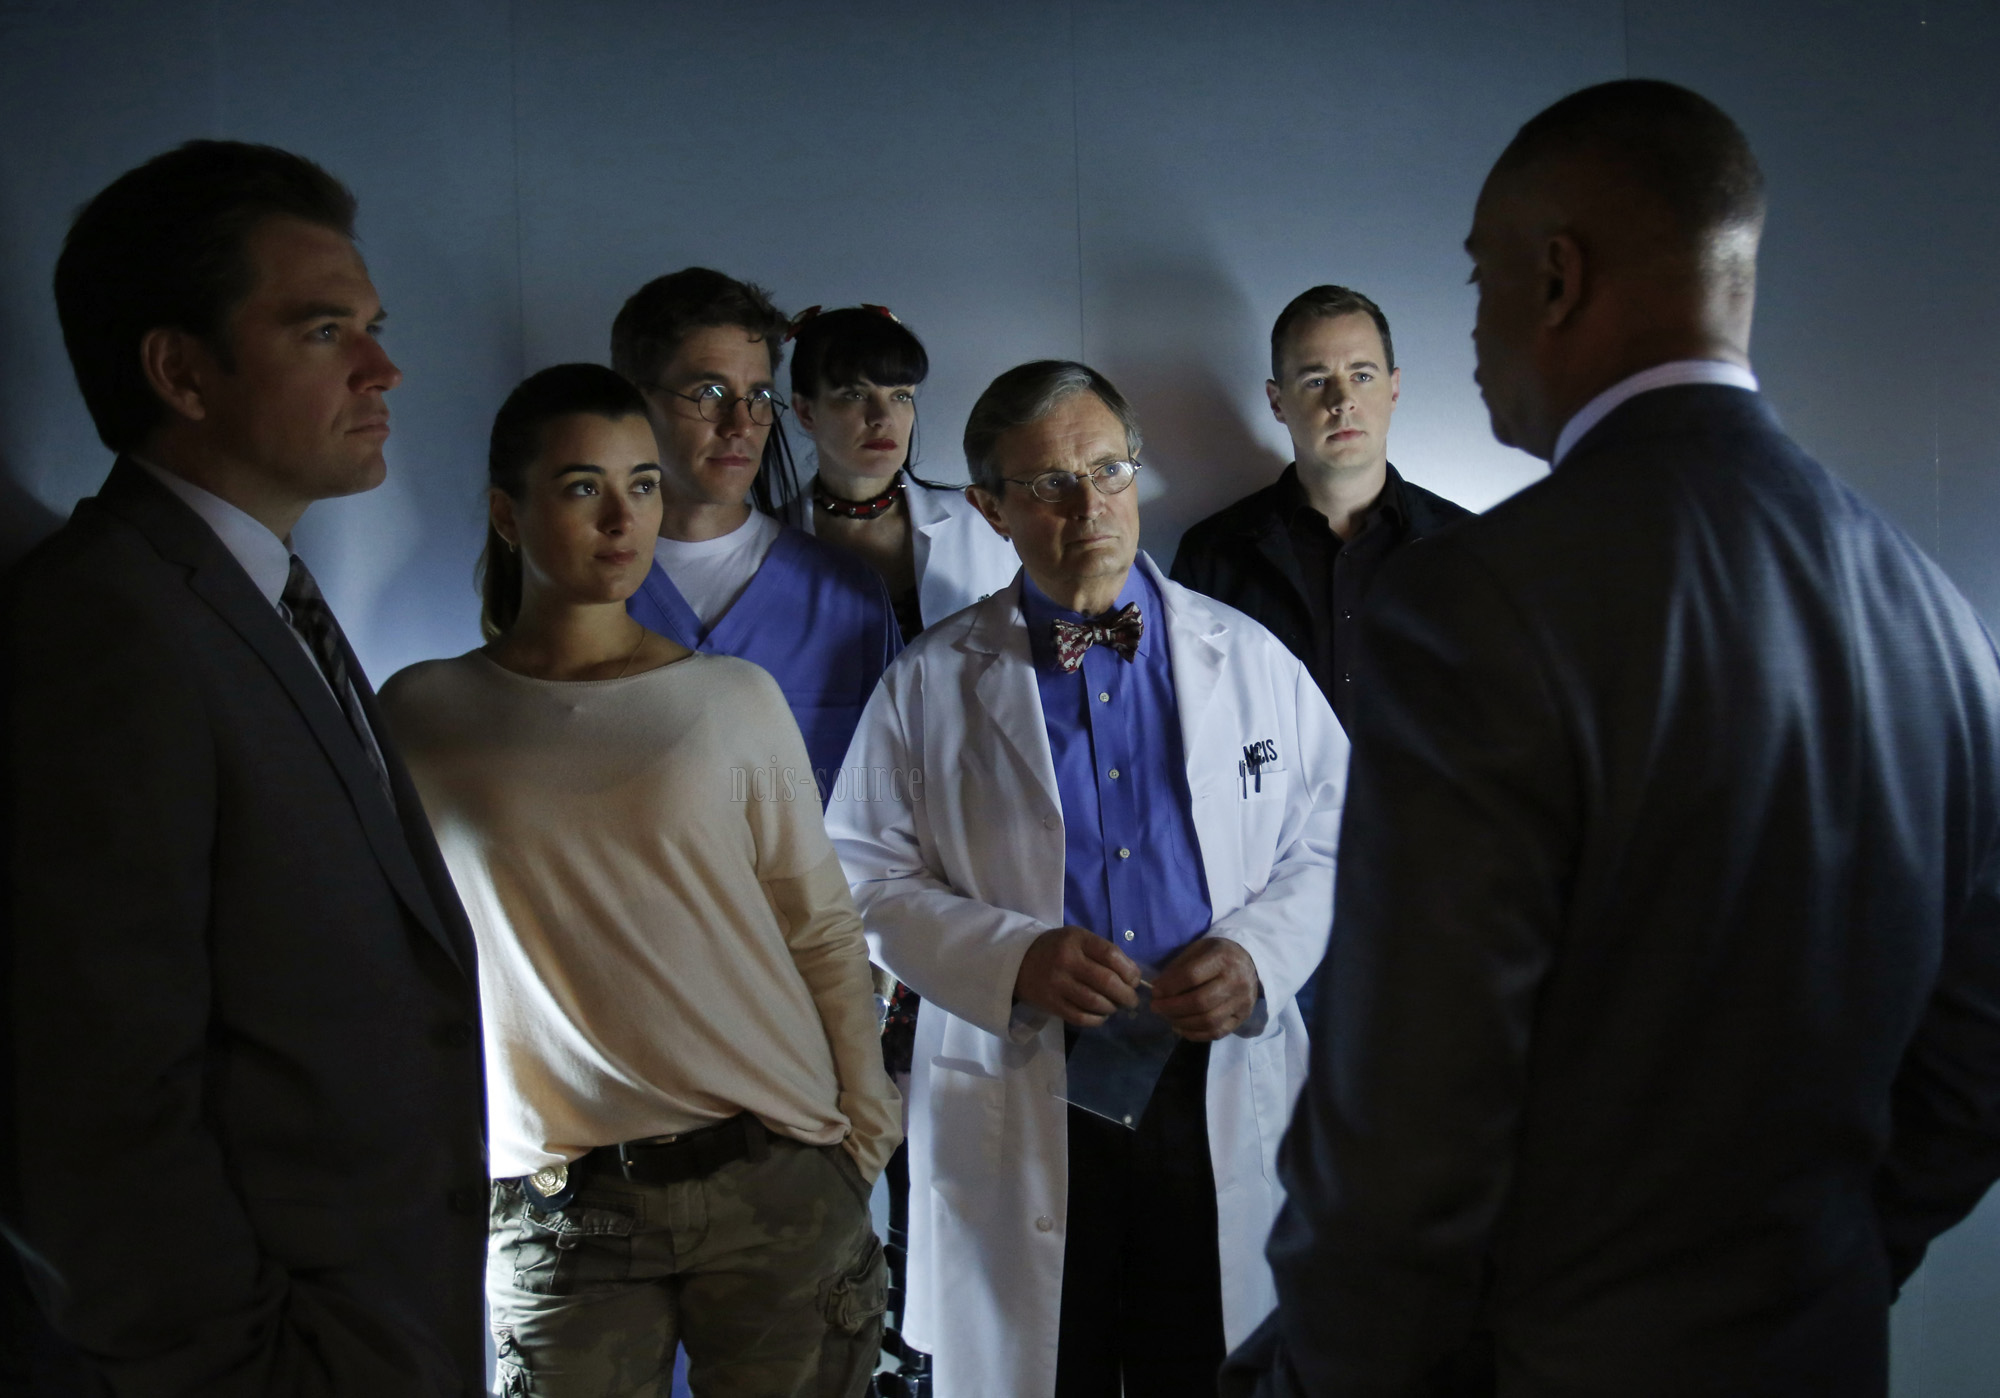 Cote de Pablo (Ziva David) NCIS 10x24 Damned If 당신 Do - episode stills